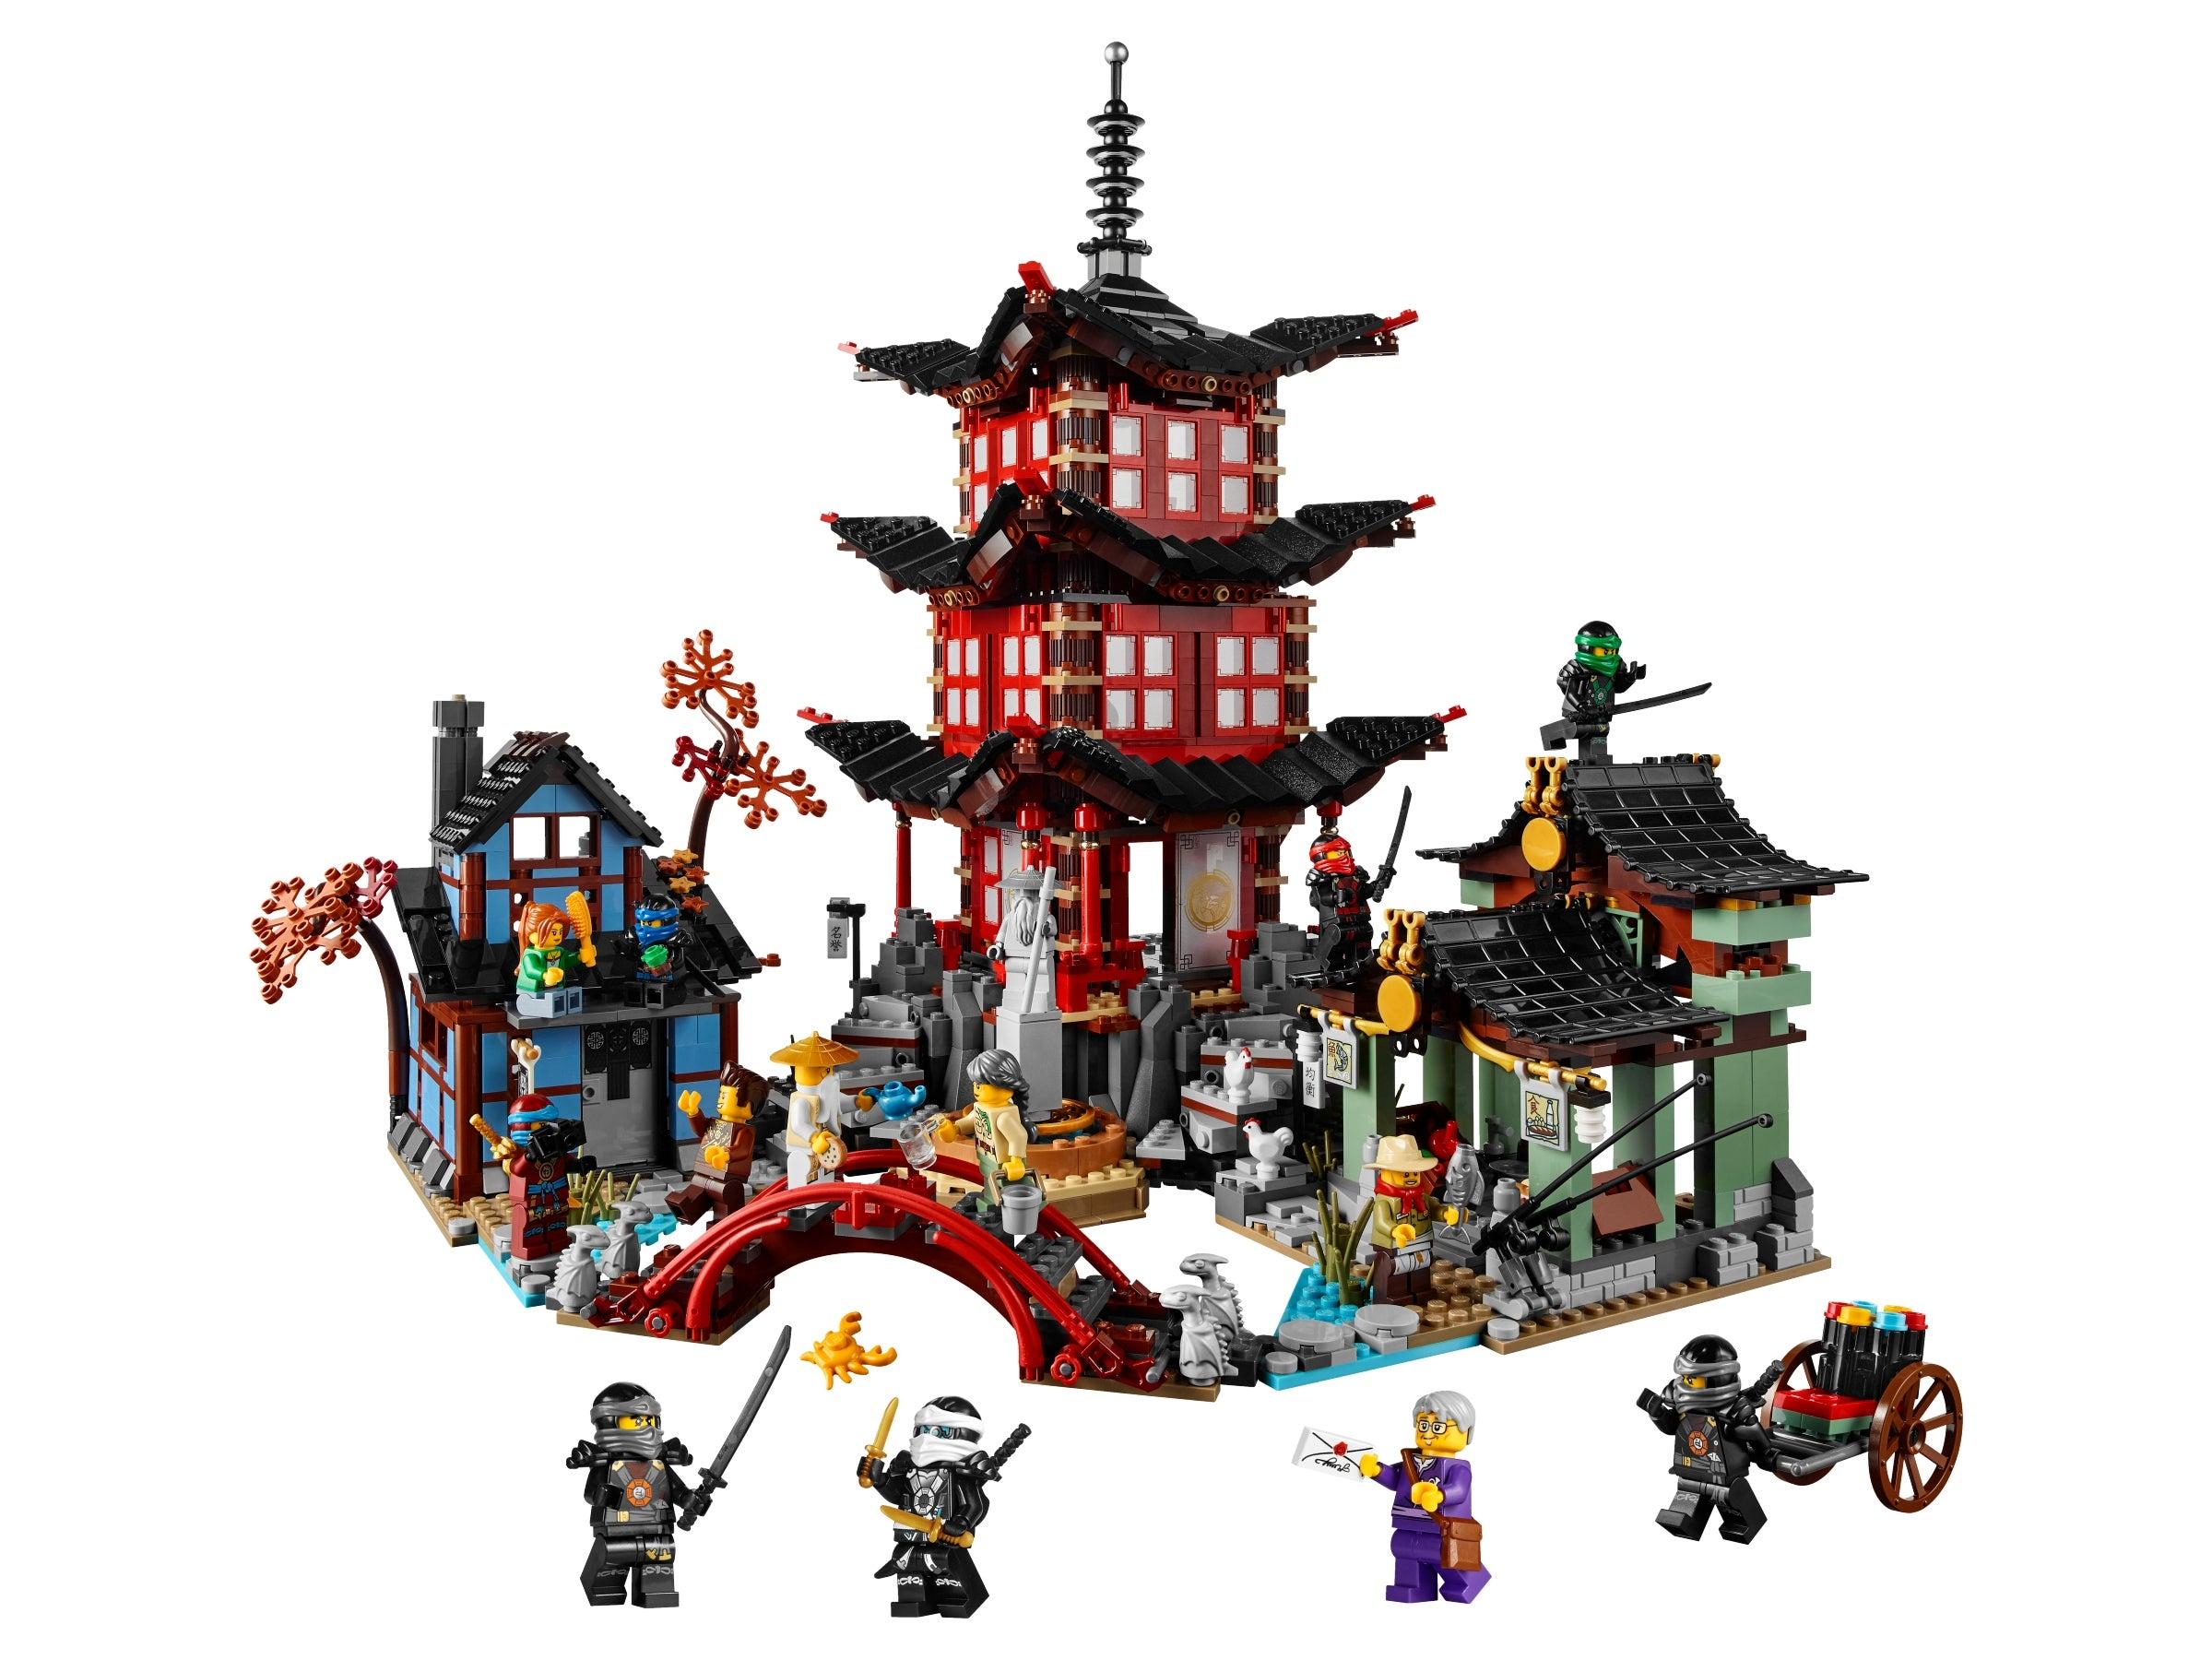 Temple of Airjitzu Lego Ninjago Kai Minifigure Set 70751 Spielzeug Bau- &  Konstruktions-Minifiguren